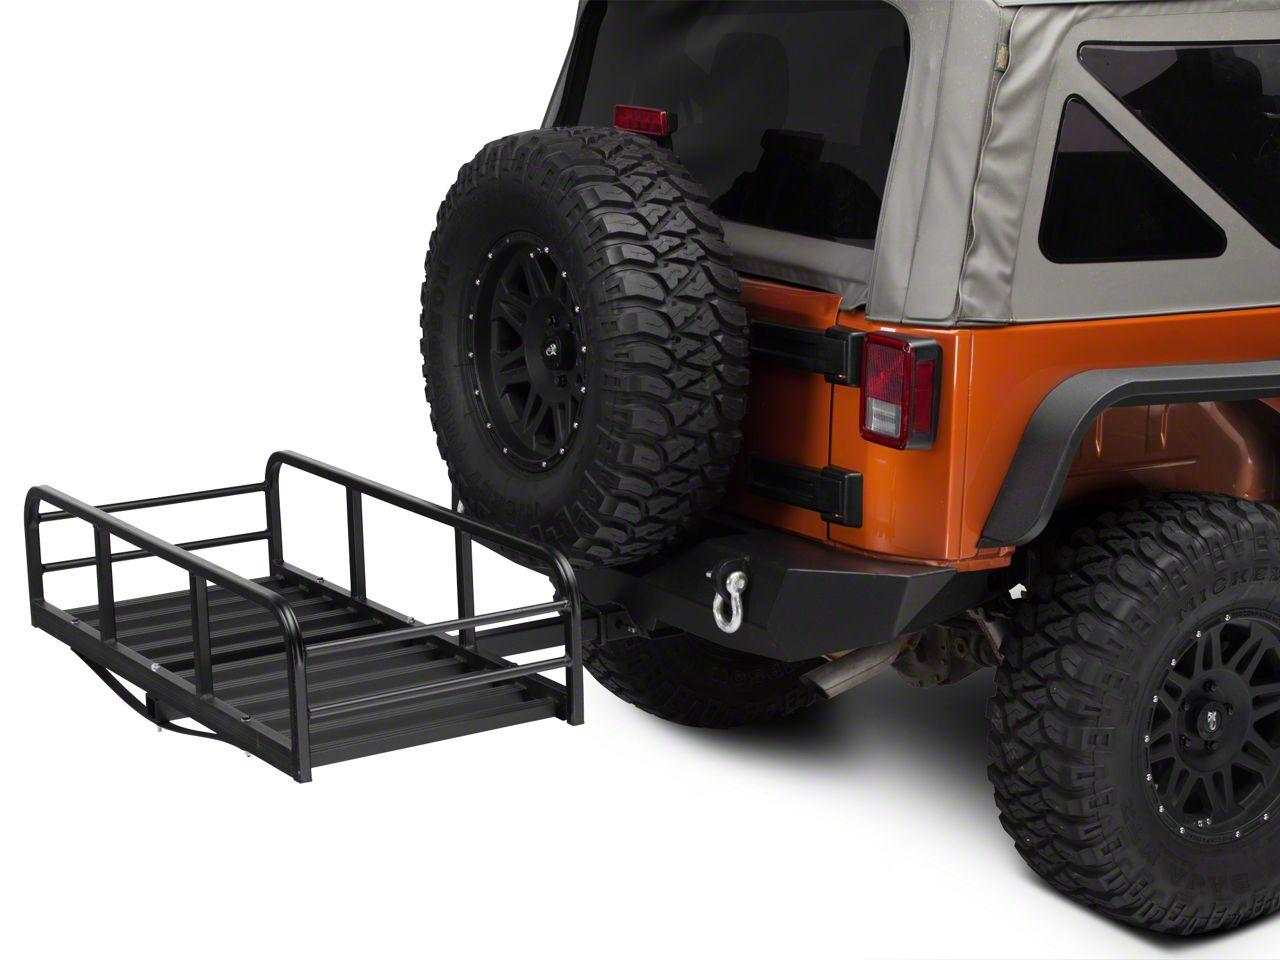 RedRock 4x4 Hitch Mounted Cargo Rack 12 in. XL (07-19 Jeep Wrangler JK & JL)